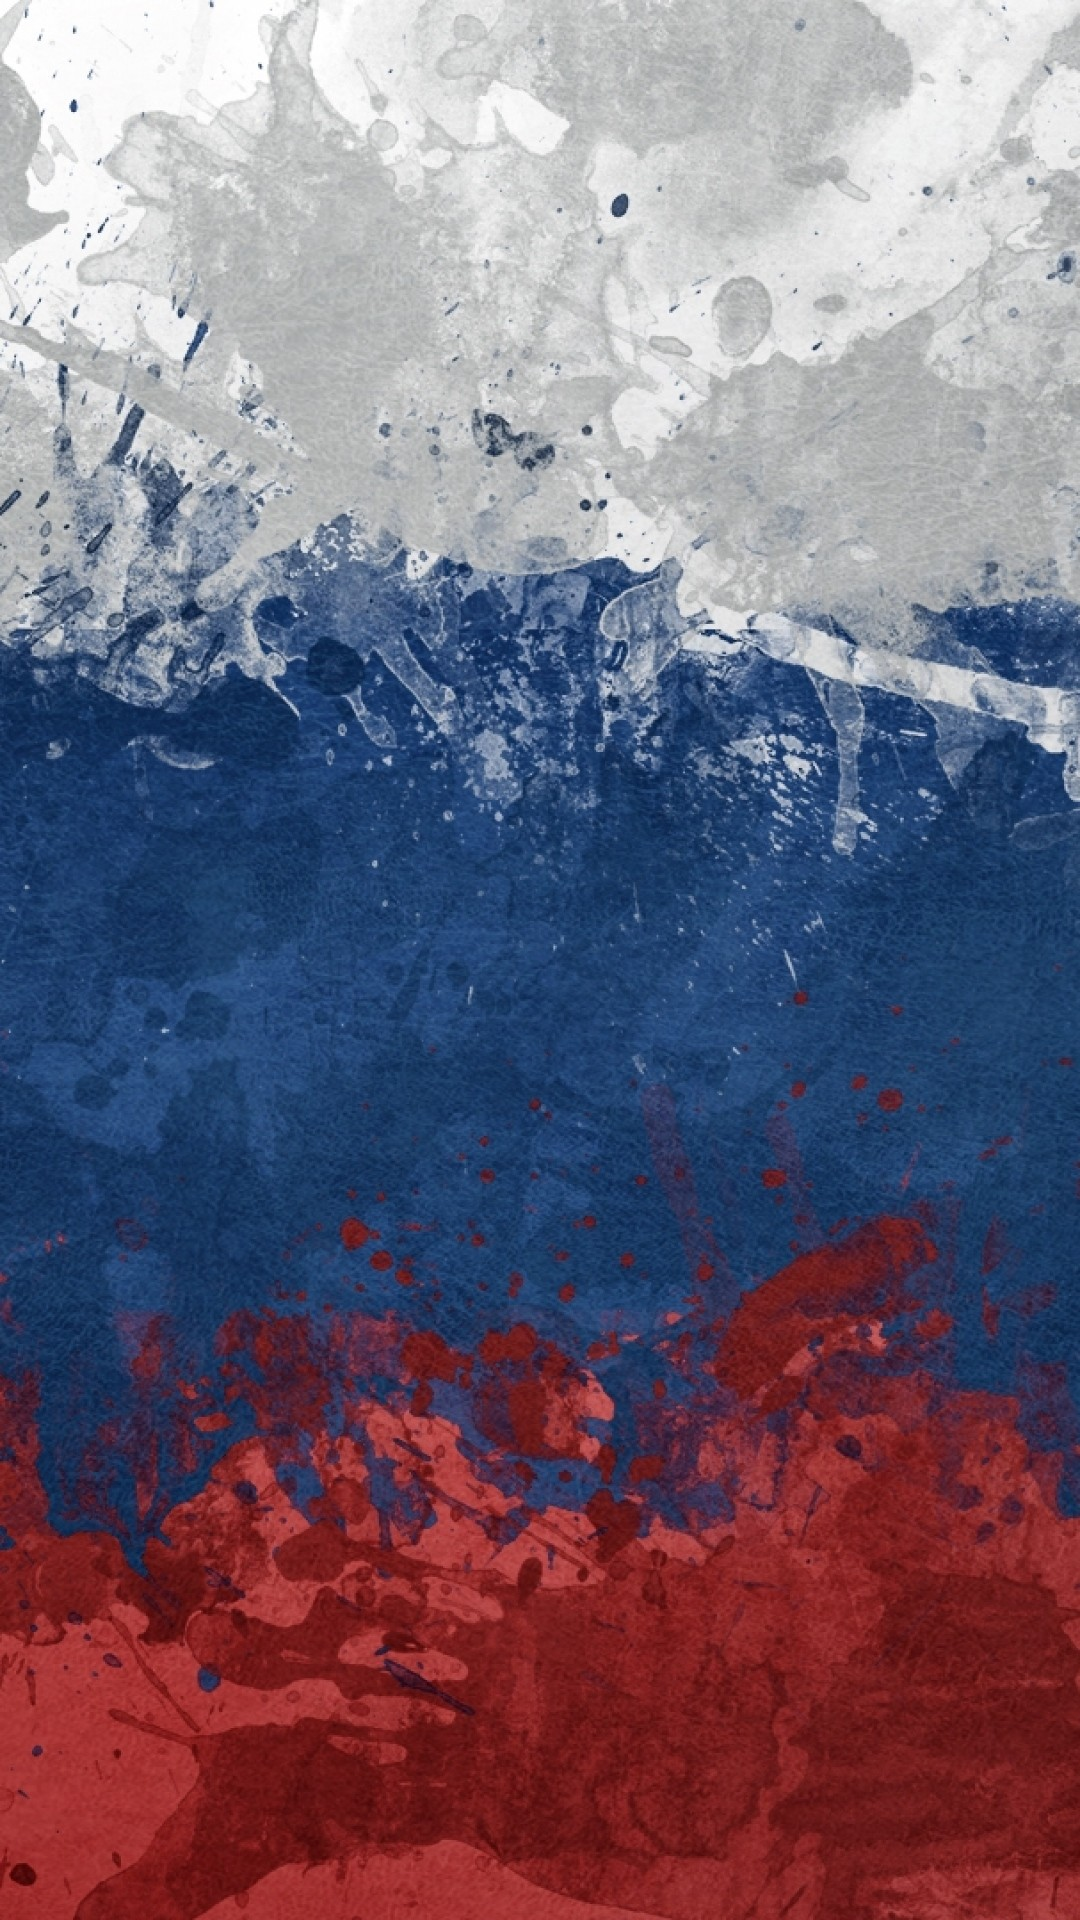 Preview wallpaper flag, russia, spots, paint, symbol, texture 1080×1920